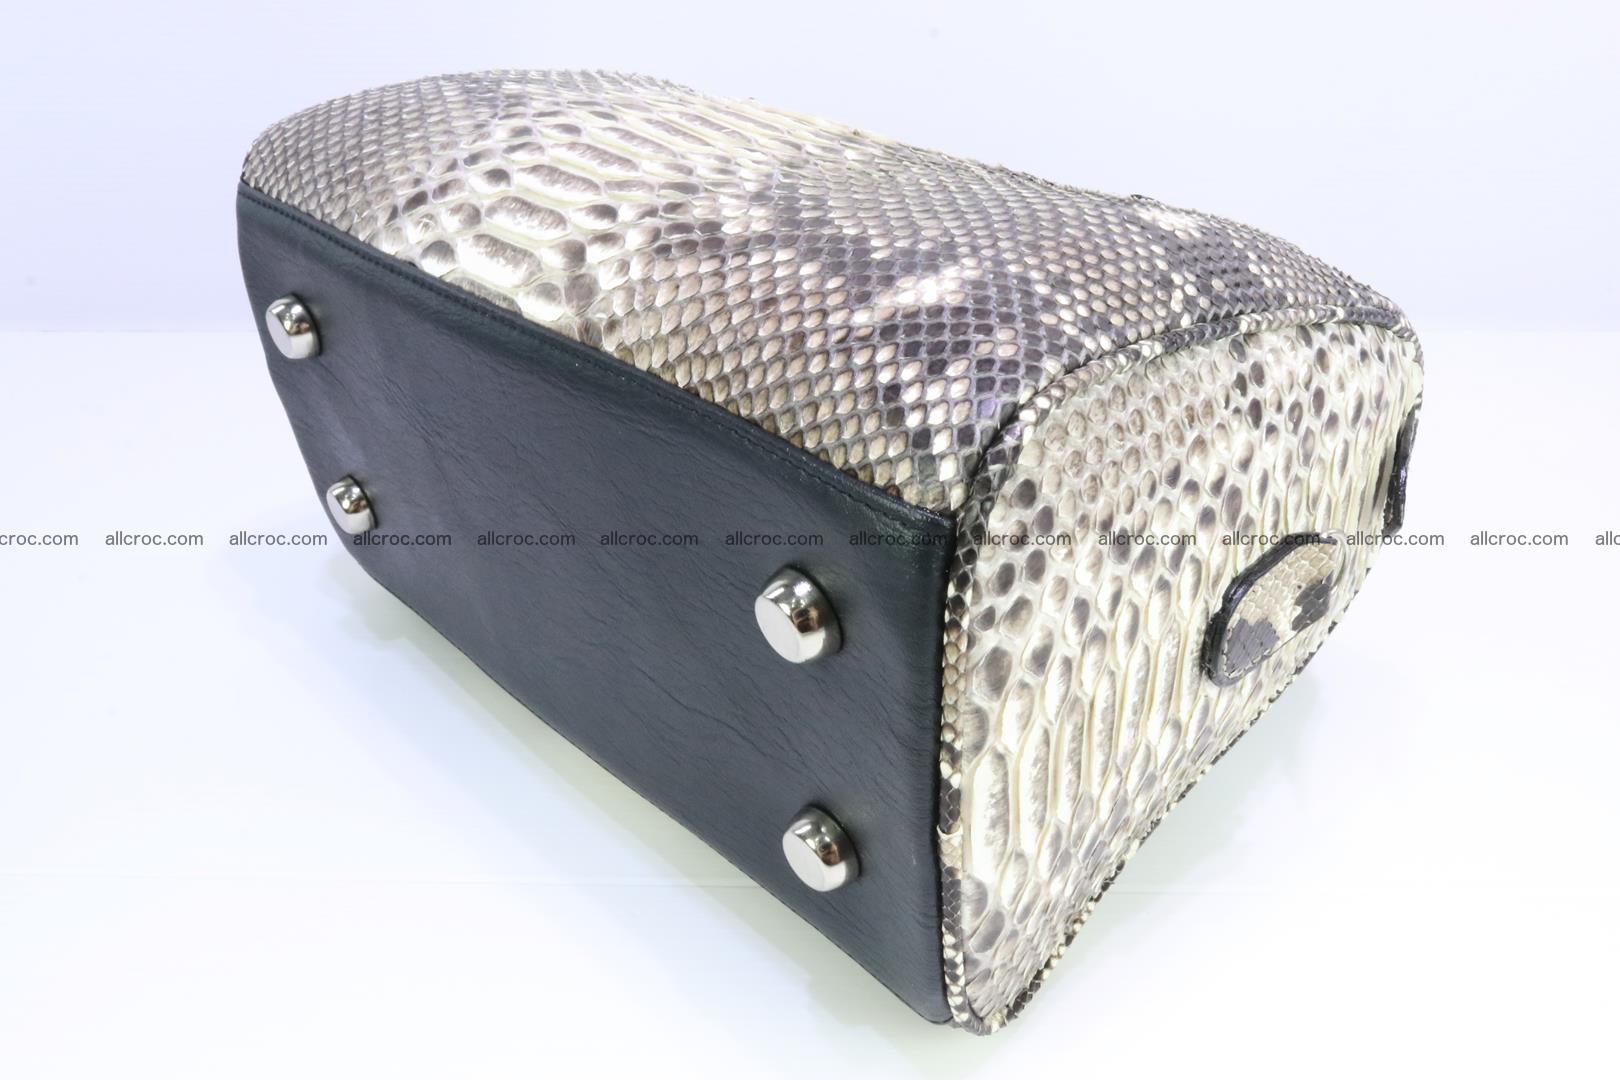 Ladies handbag, valise from genuine python skin MINI 210 Foto 10